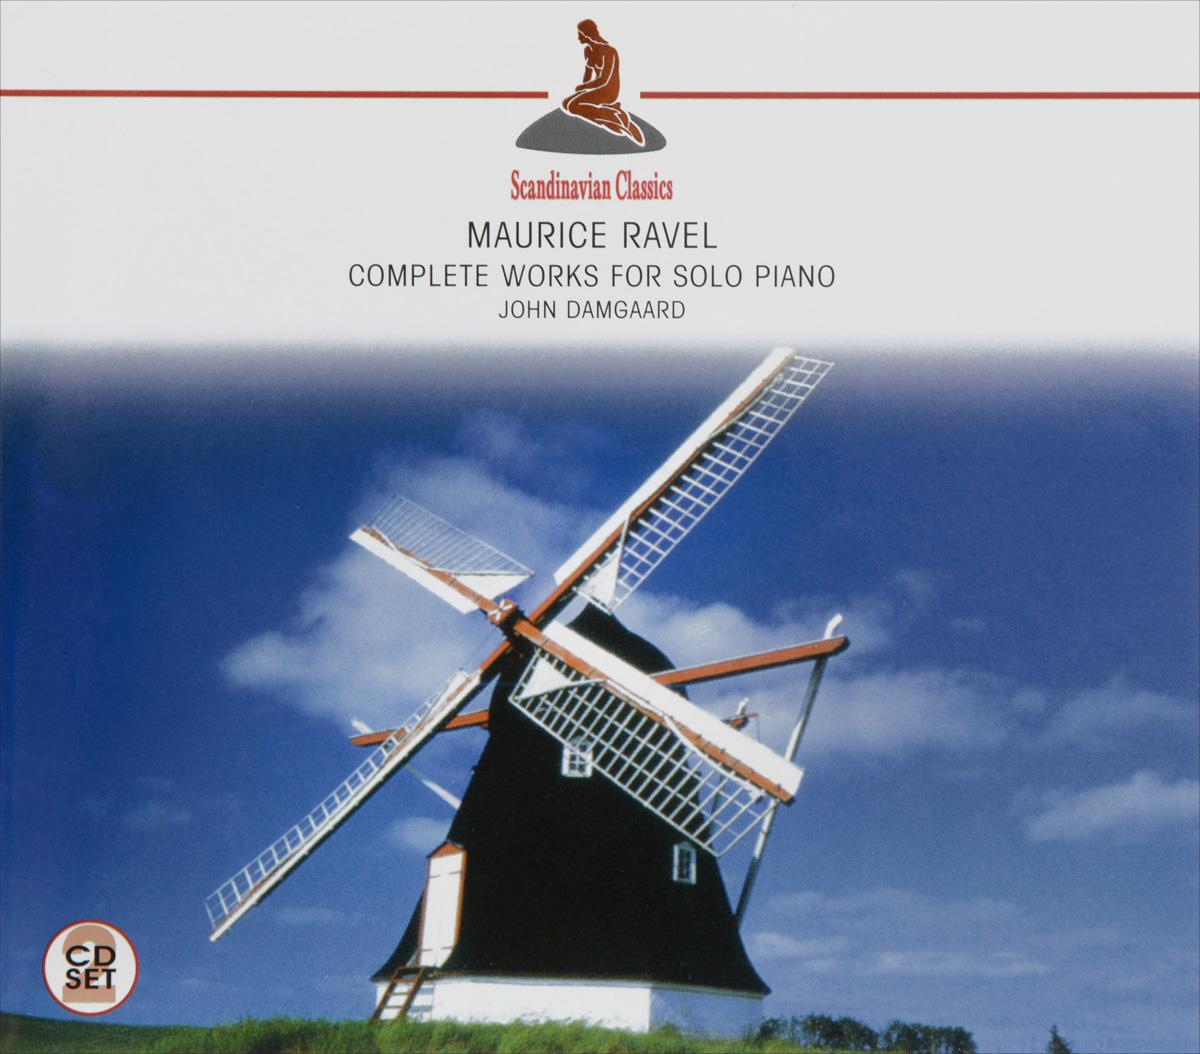 John Damgaard Scandinavian Classics. John Damgaard. Maurice Ravel. Complete Works For Solo Piano (2 CD) цены онлайн